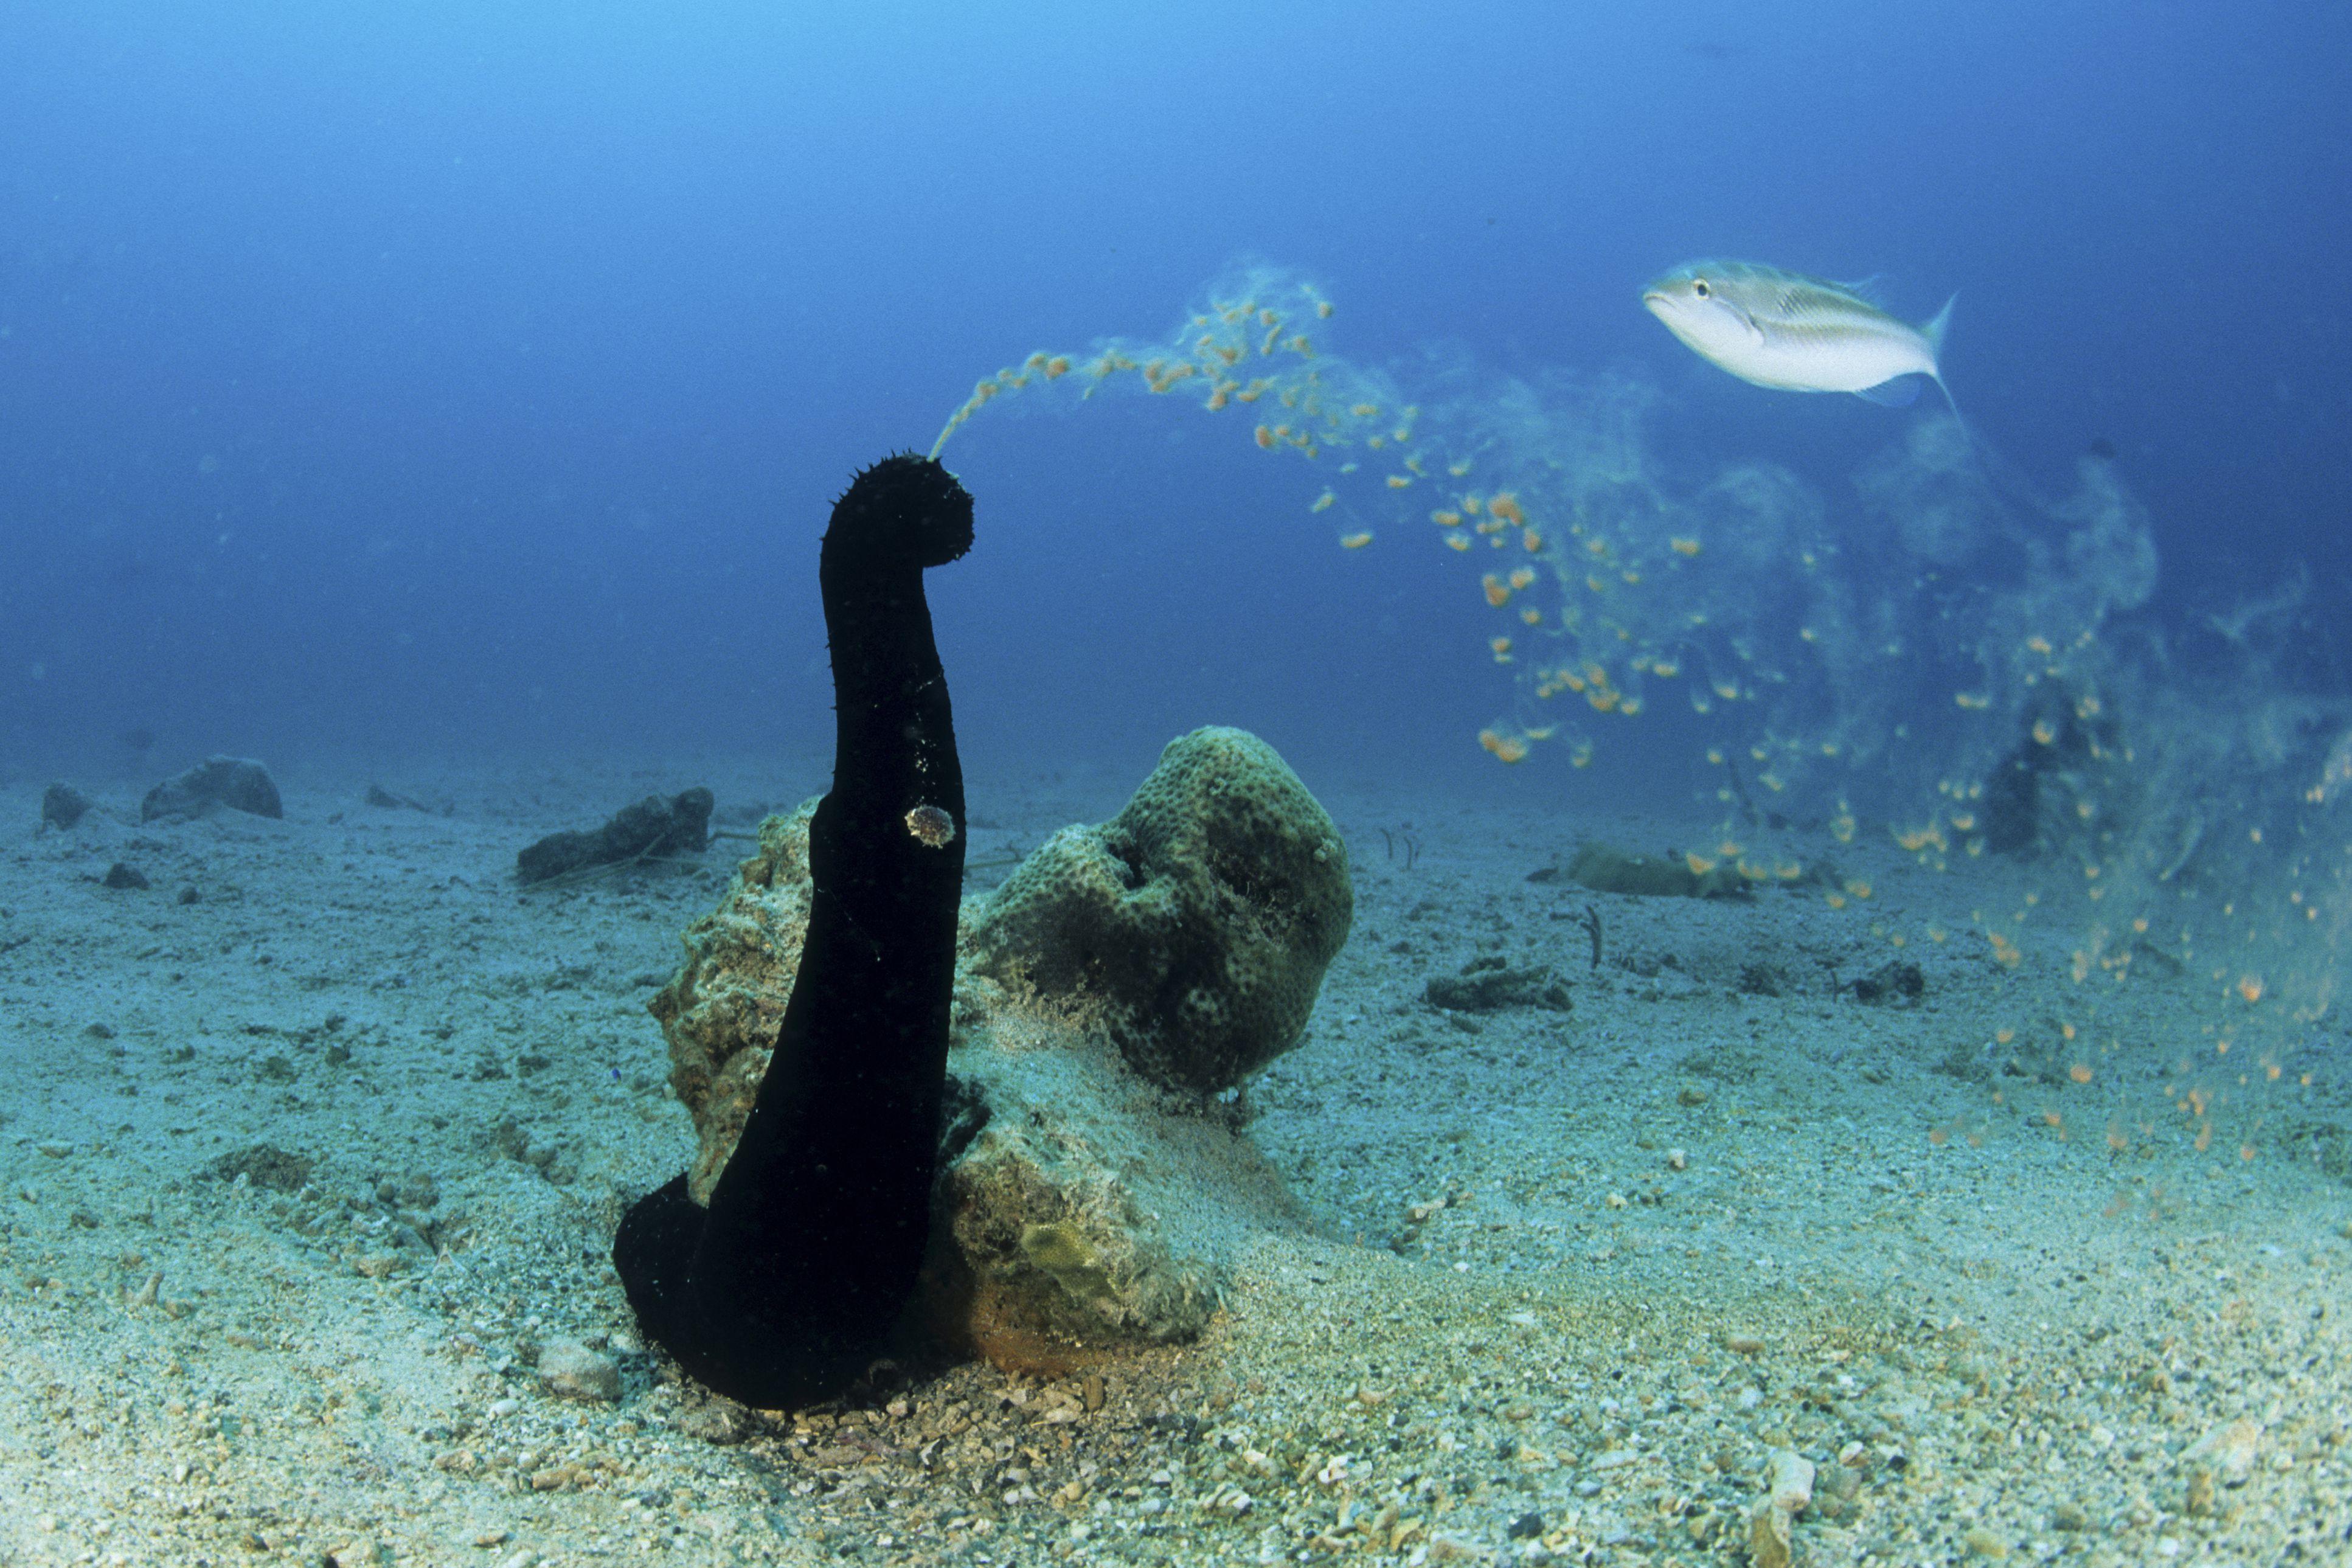 Sea cucumber spawning eggs